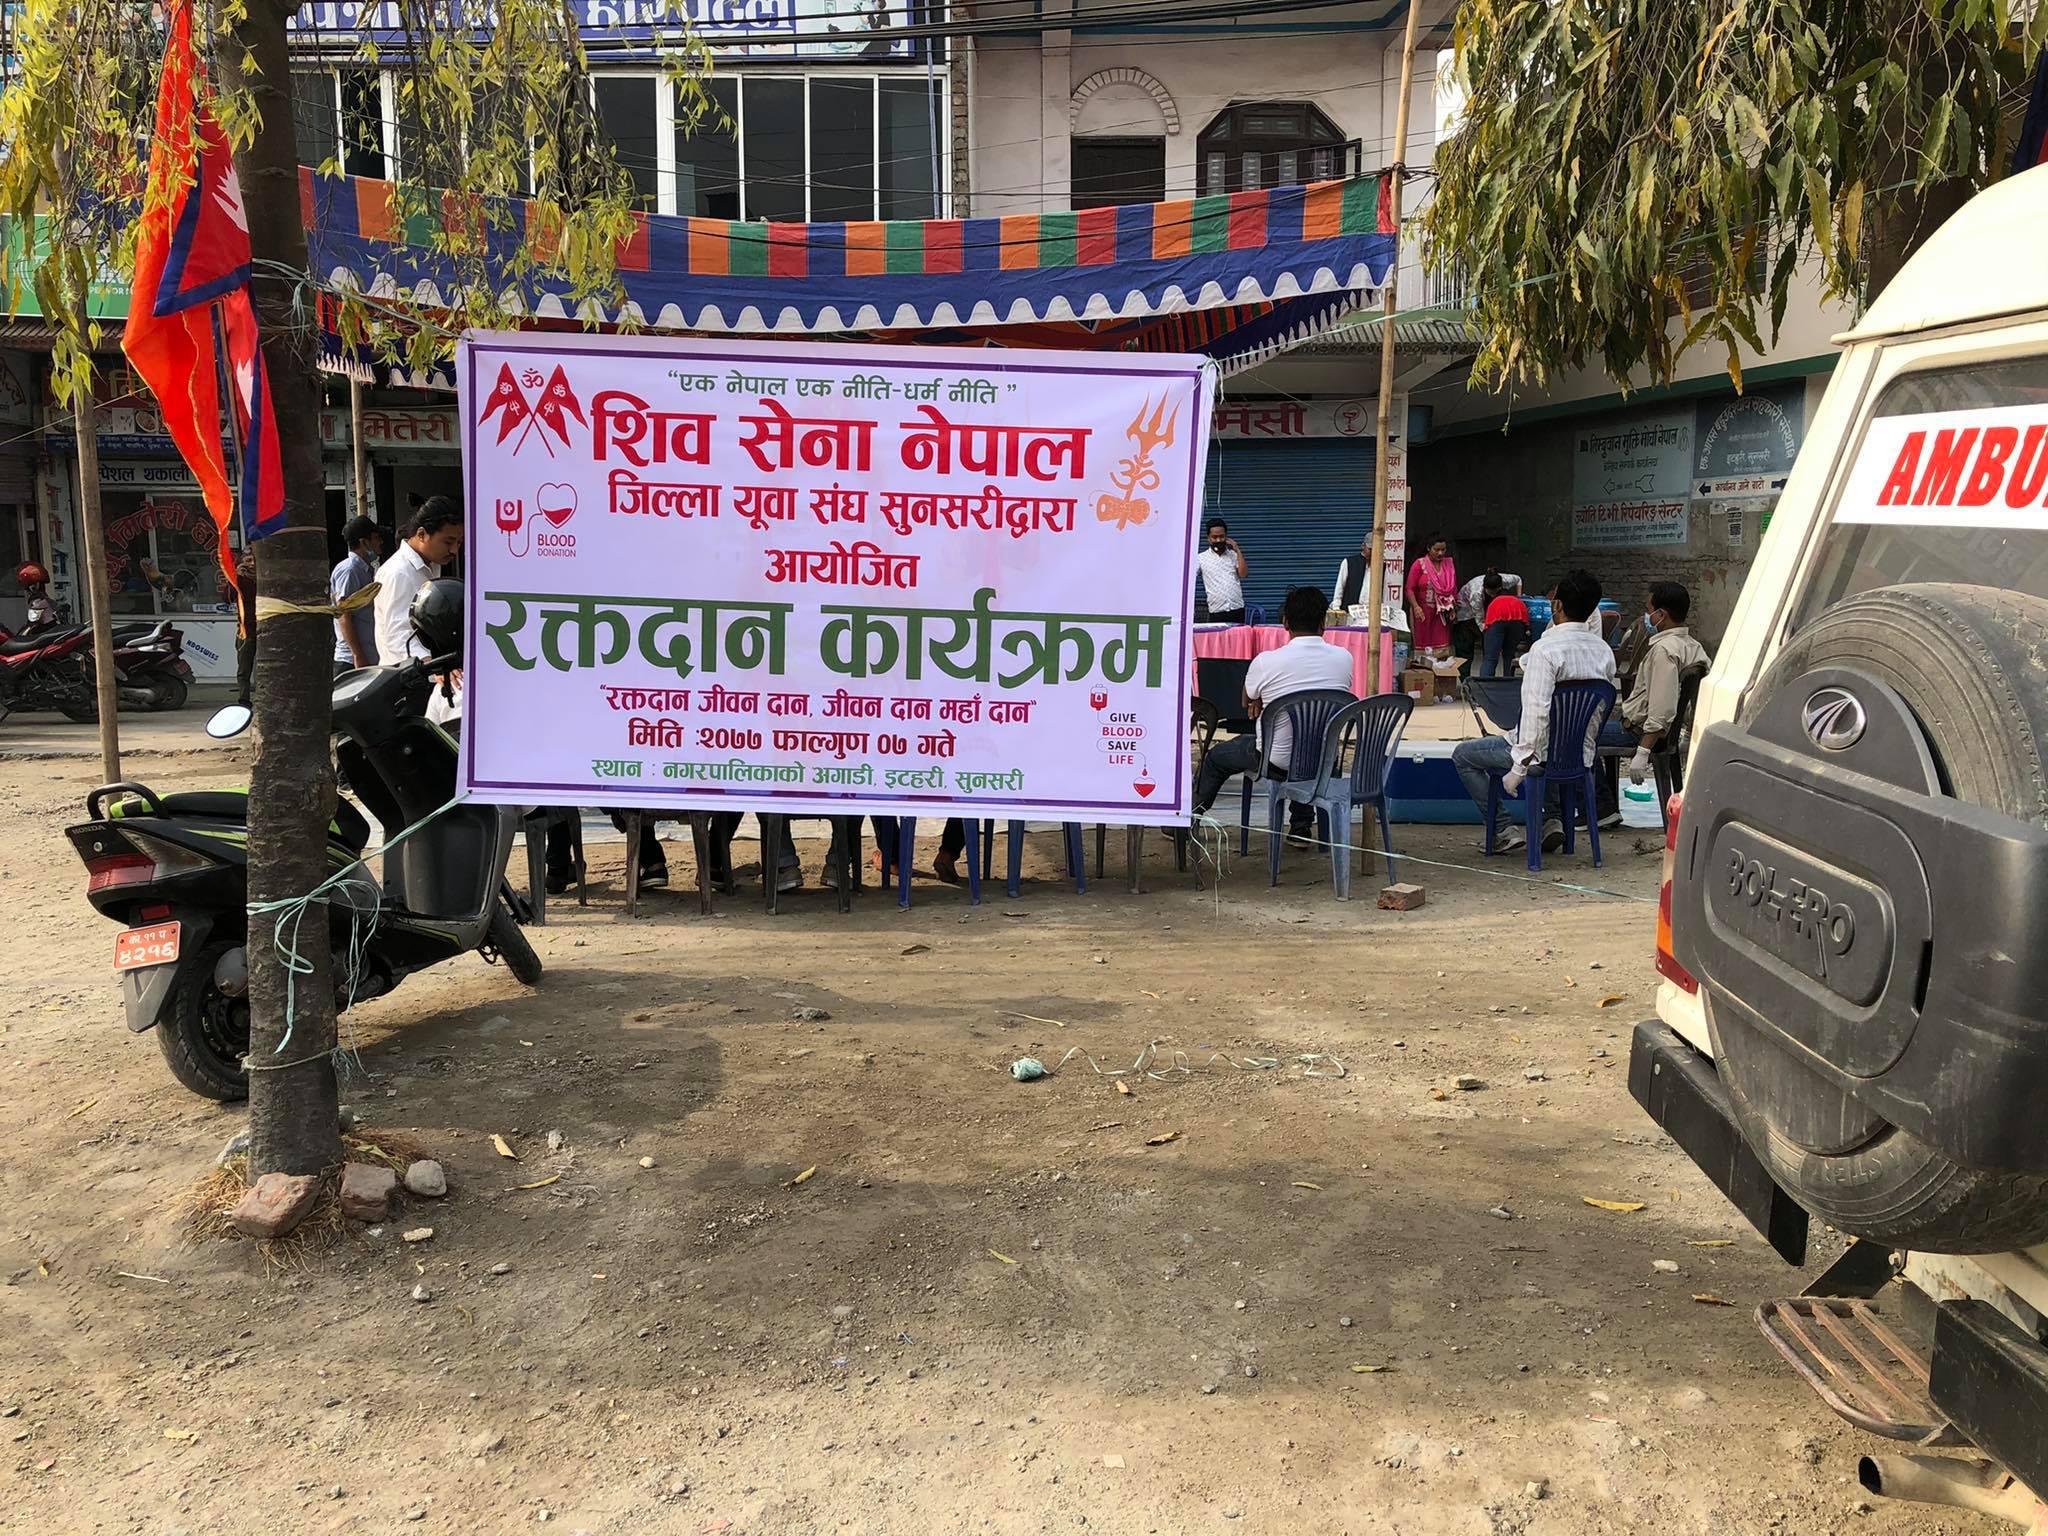 शिवसेना युवा संघ सुनसरी  द्वारा रक्तदान